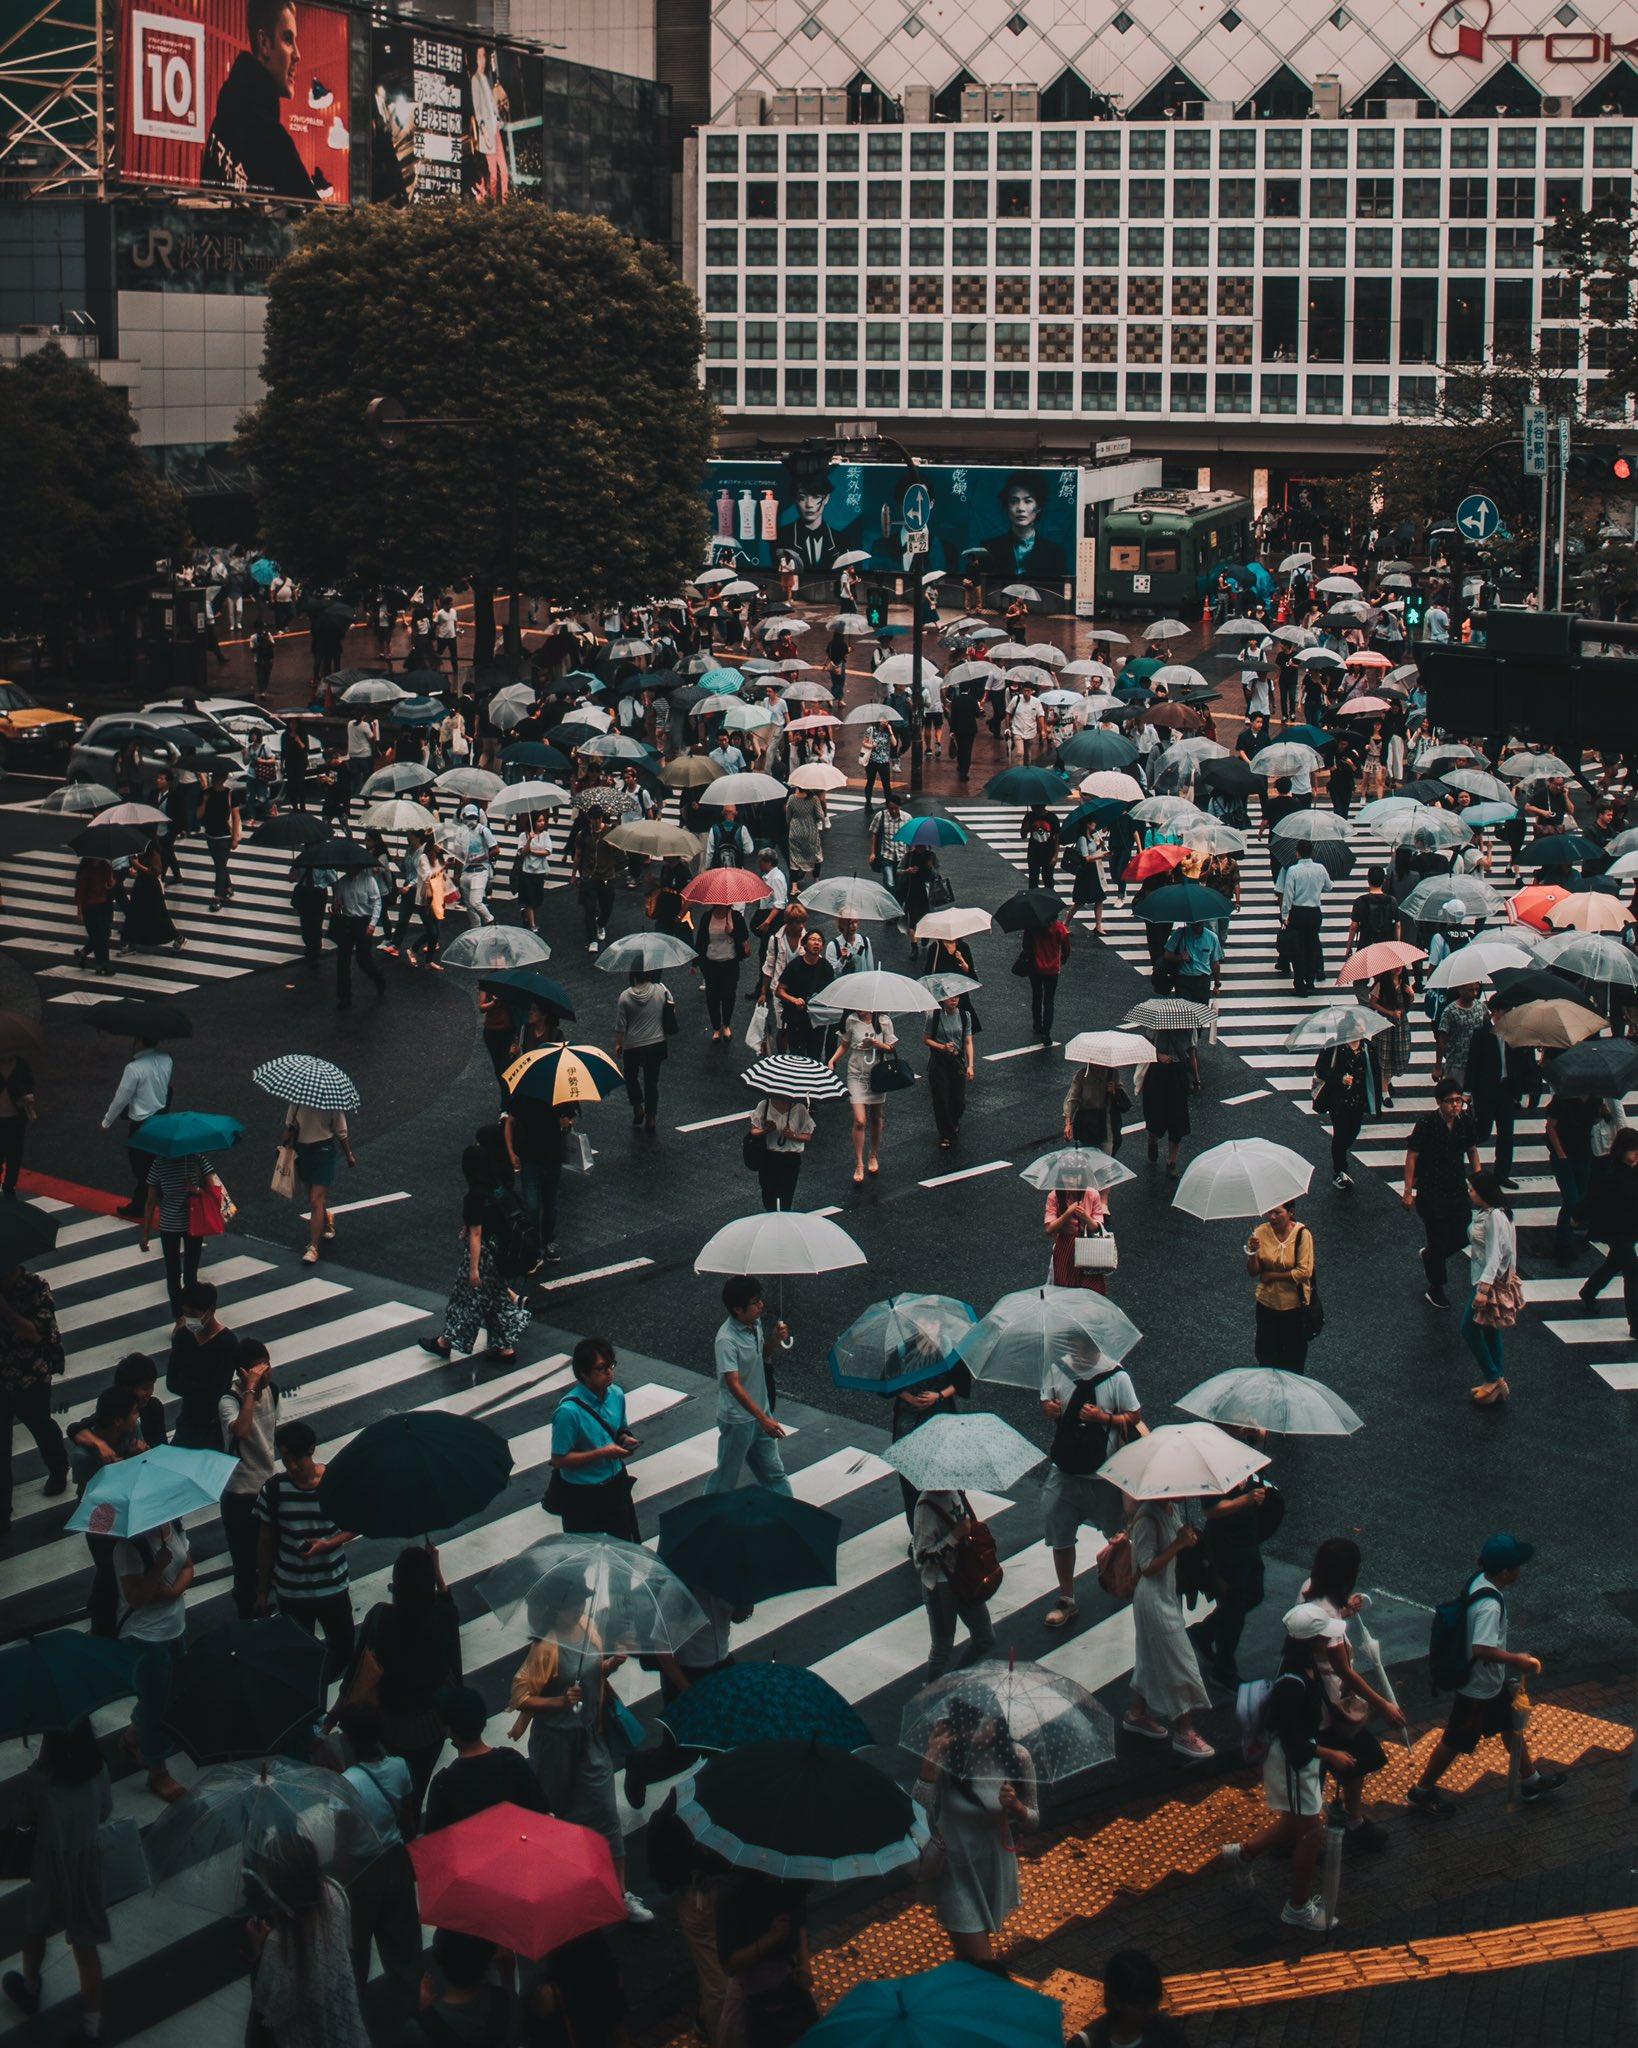 Tokyo in rain ���� https://t.co/BT2AhcFYHZ